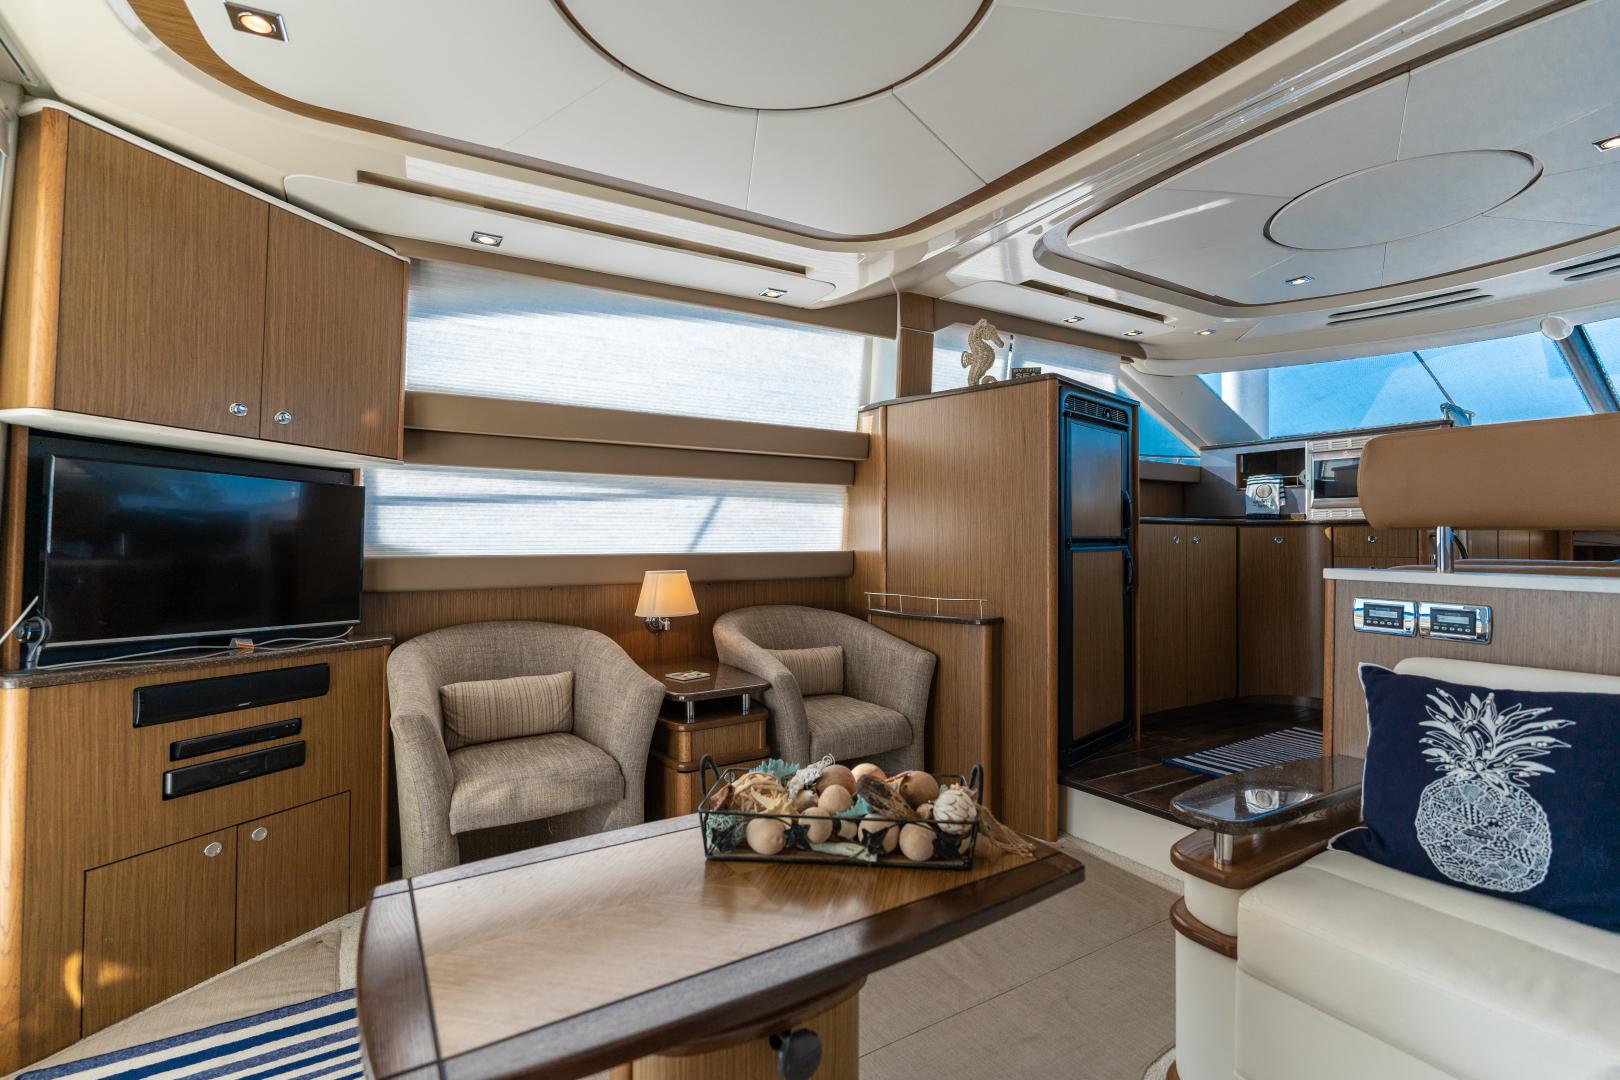 Meridian-441 Motor Yacht 2016-Friend Ship League City-Texas-United States-Meridian 441 2016 Friend Ship-1508194 | Thumbnail